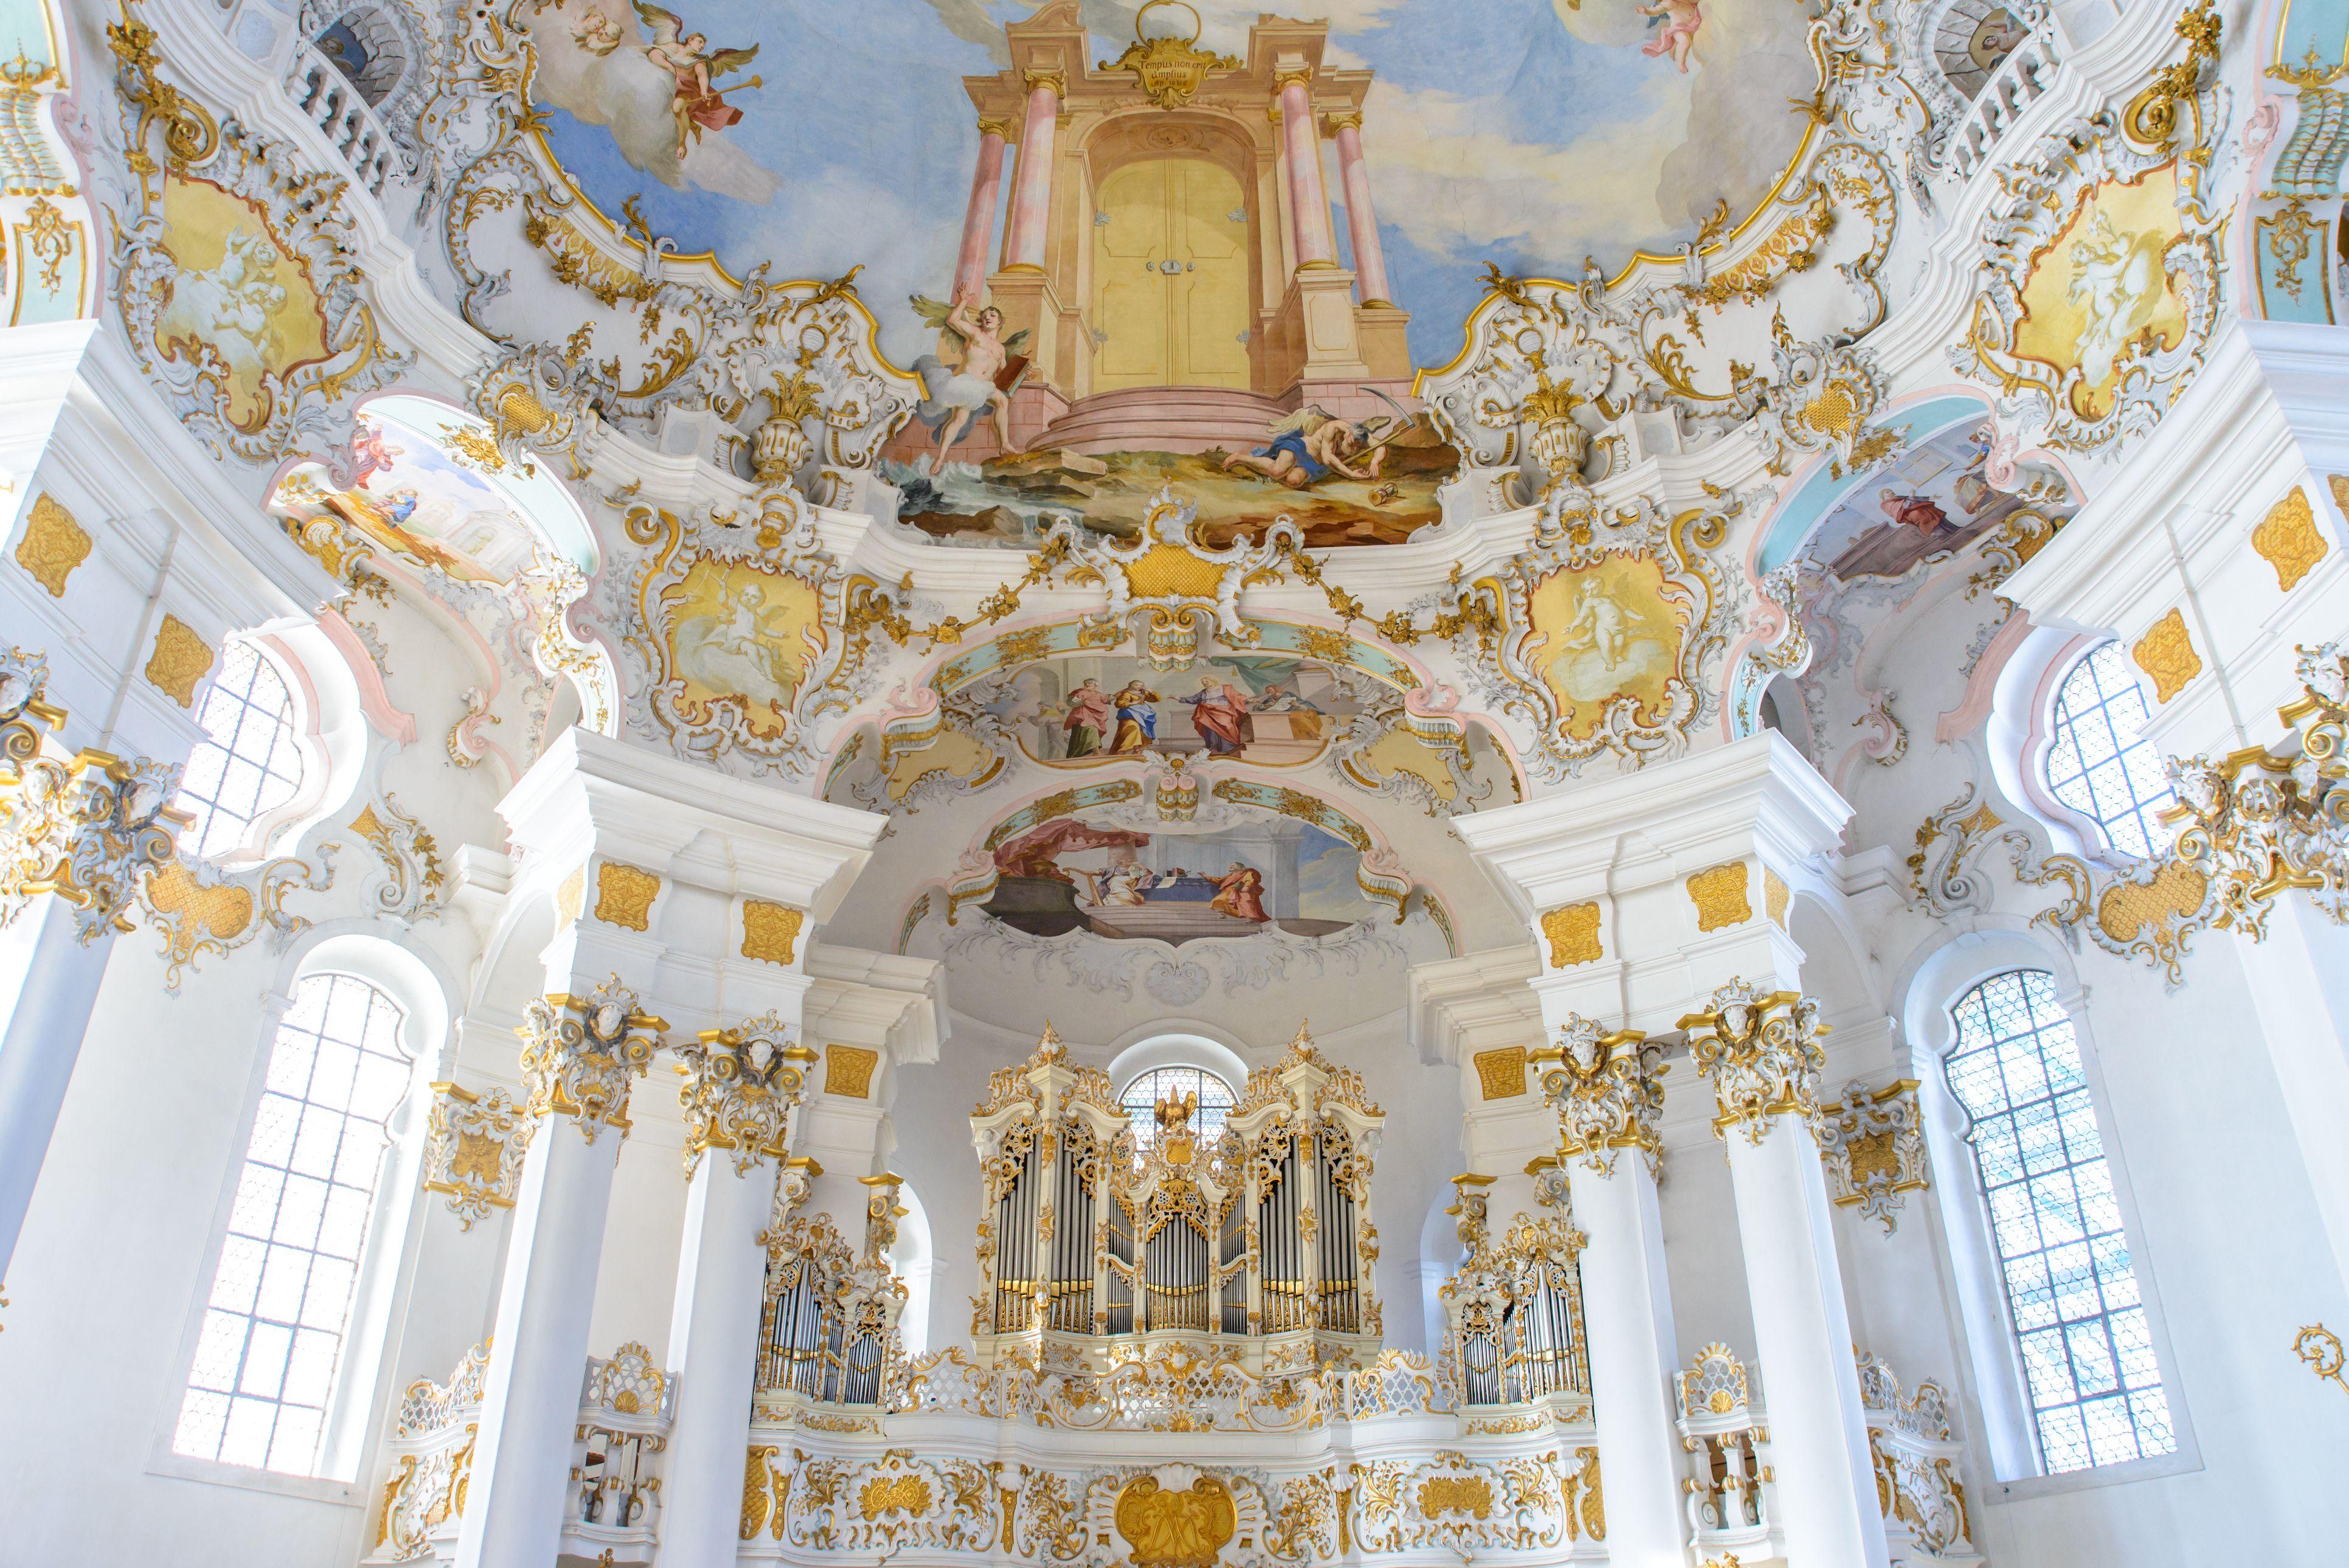 wieskirche church in bavaria, Germany